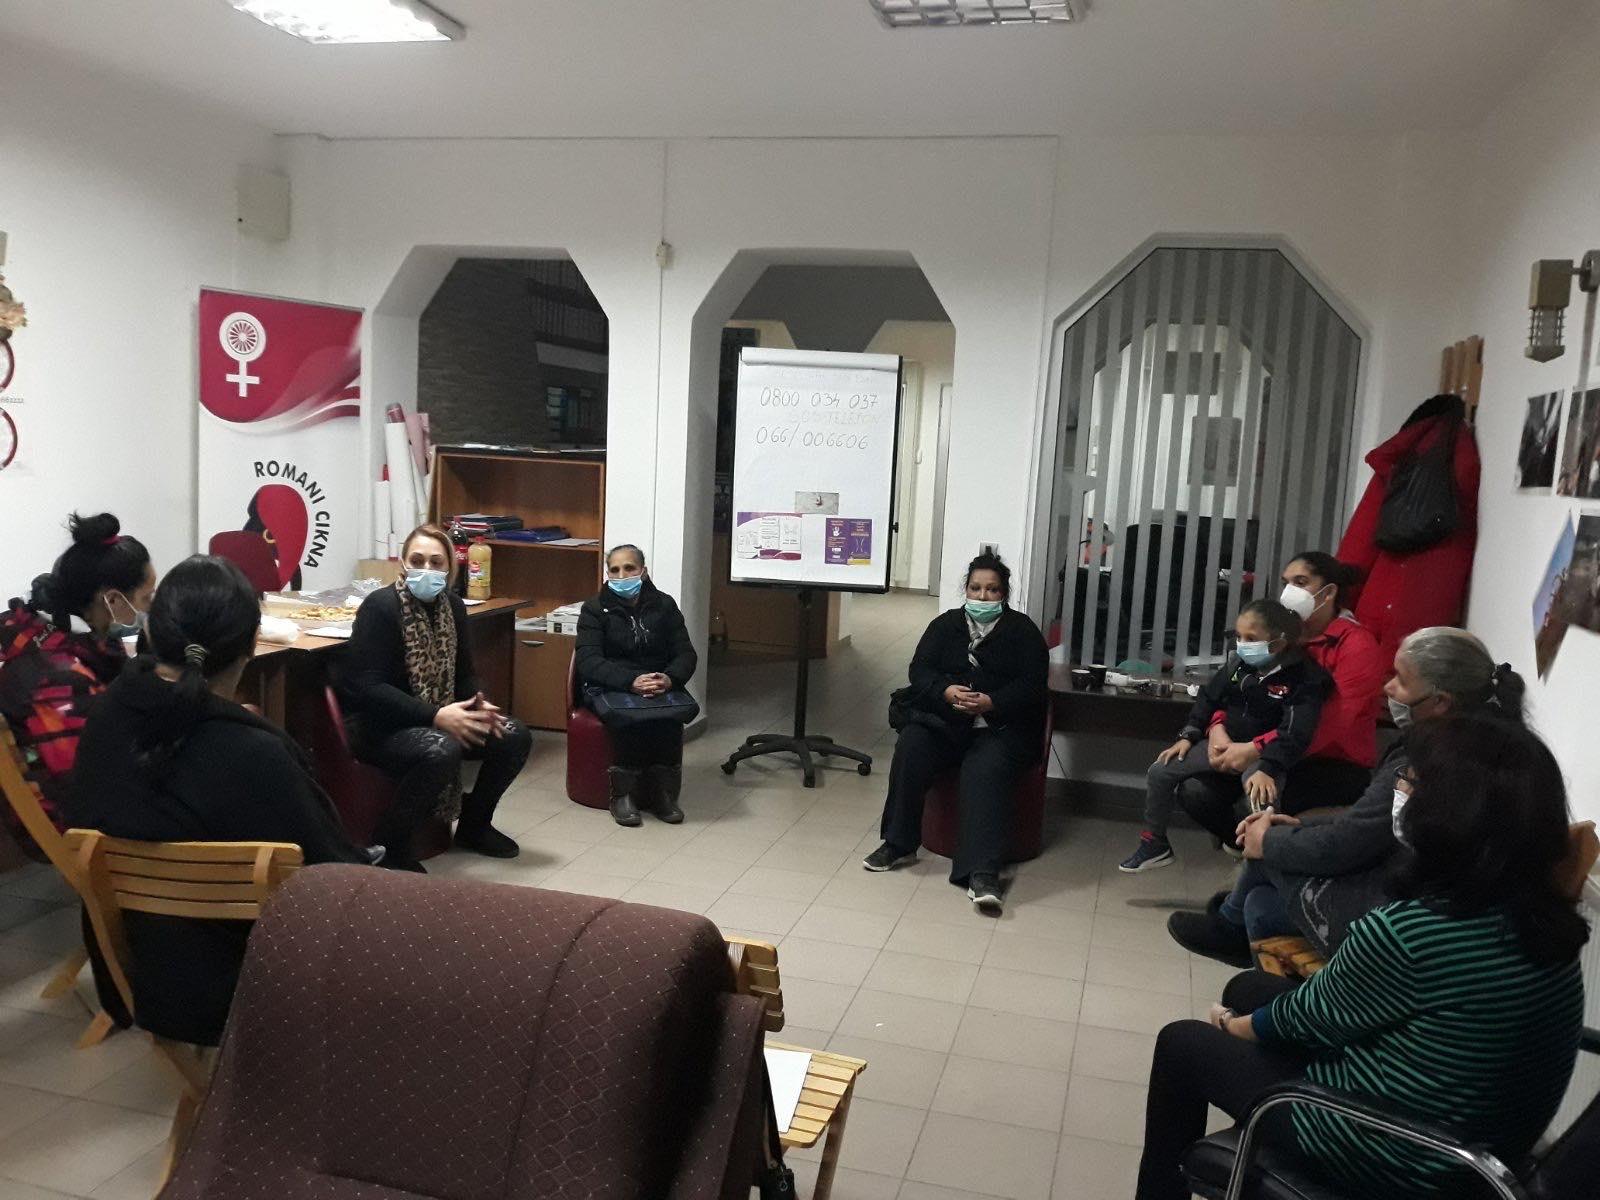 Udruzenje zena Pescanik - Radionica prevencije nasilja u porodici za žene iz romskih naselja